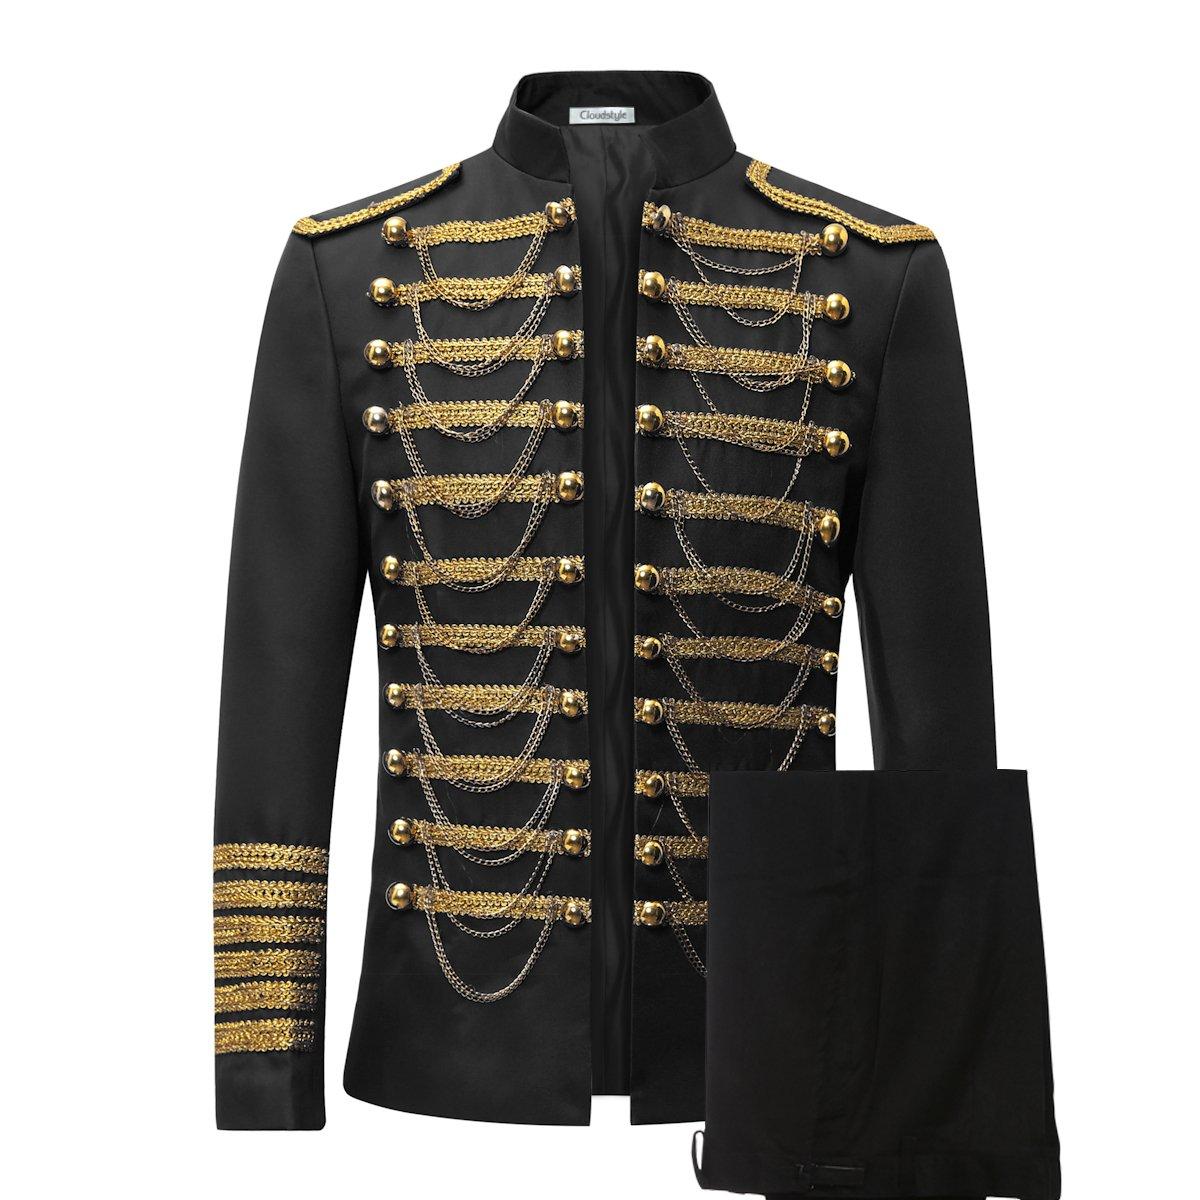 Men's Luxury Slim Fit Stylish Suit Blazer Jacket & Trousers Set 2-Piece,Black,X-Small